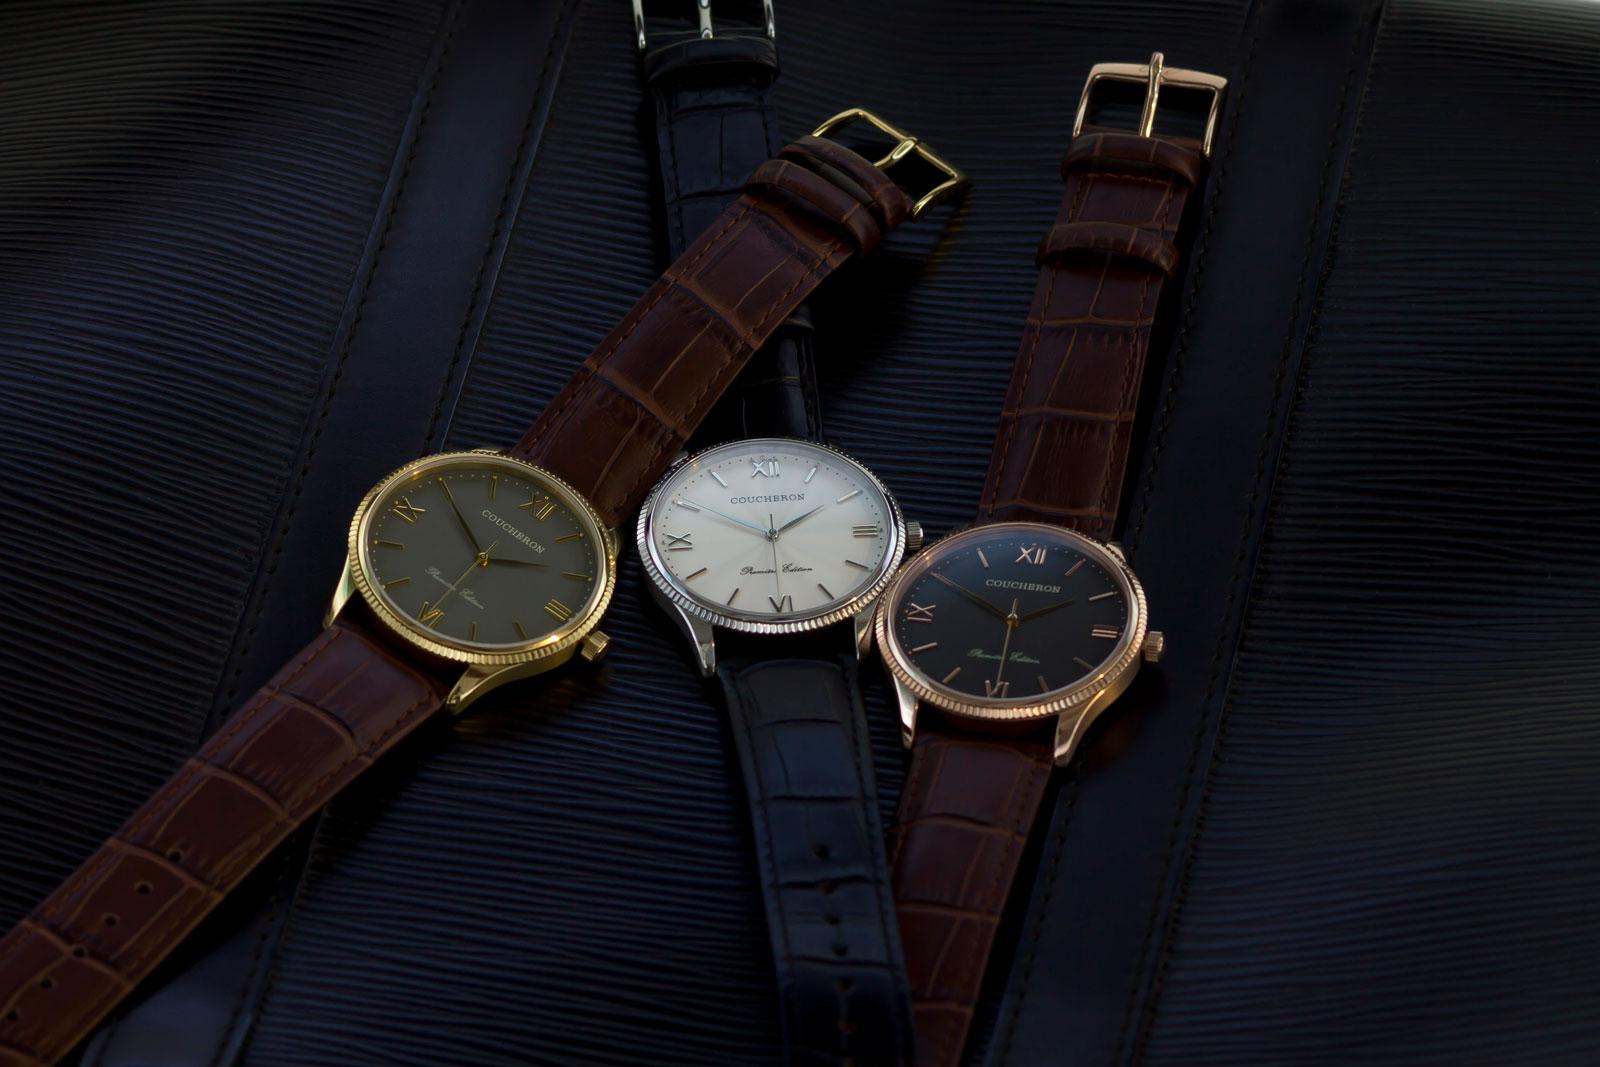 160905-cw-3x-watch-on-black-leather_lq_web